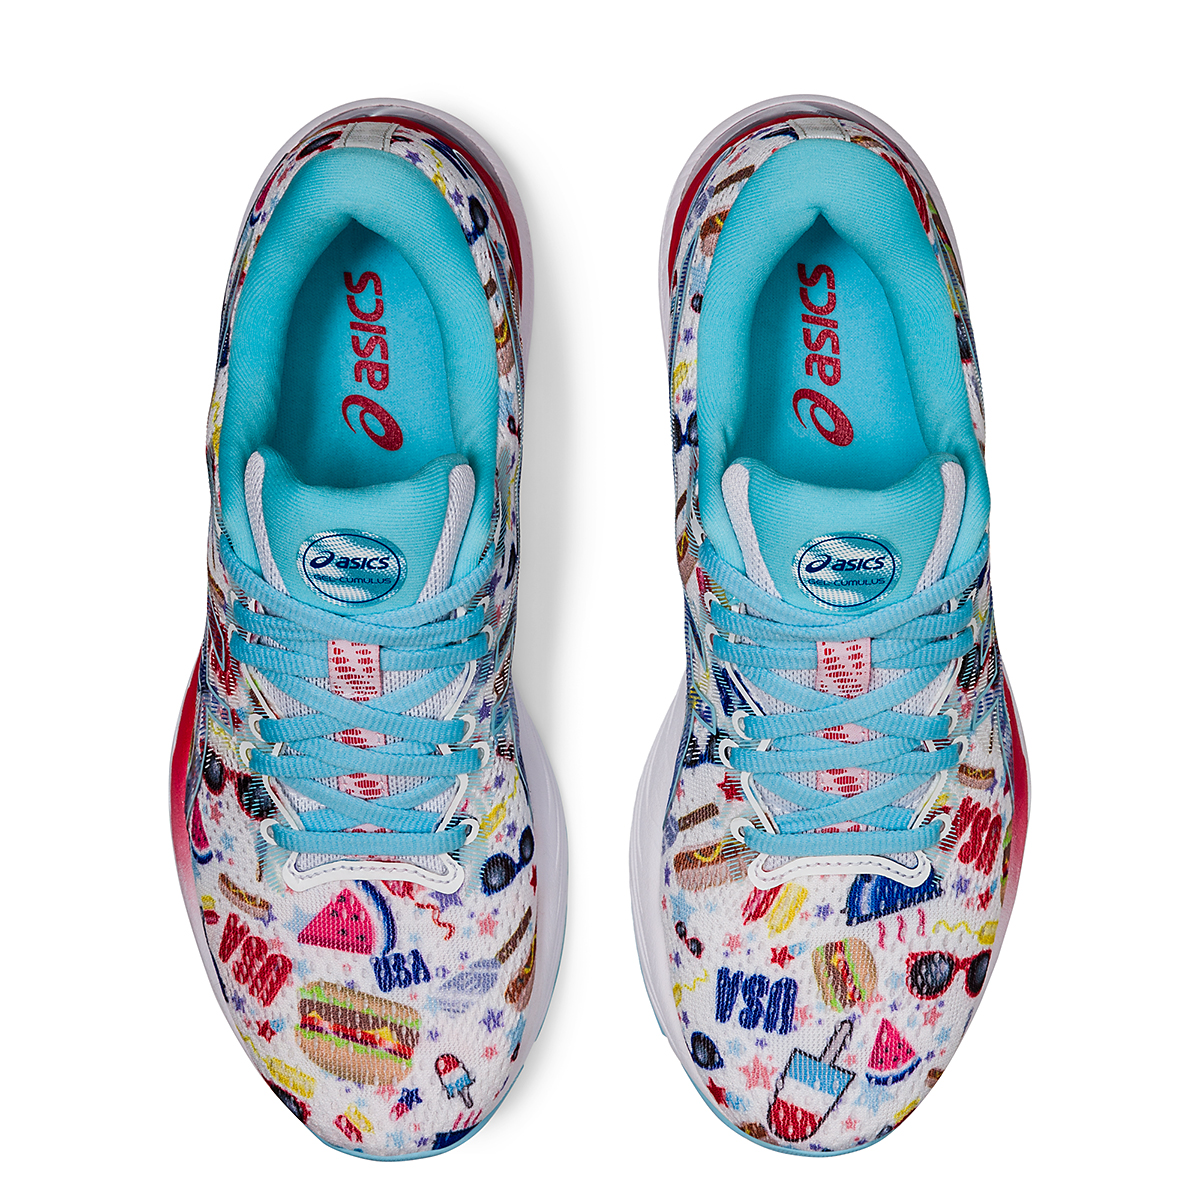 Women's Asics Gel-Cumulus 23 Cookout Running Shoe - Color: White/Asics Blue - Size: 5 - Width: Regular, White/Asics Blue, large, image 6